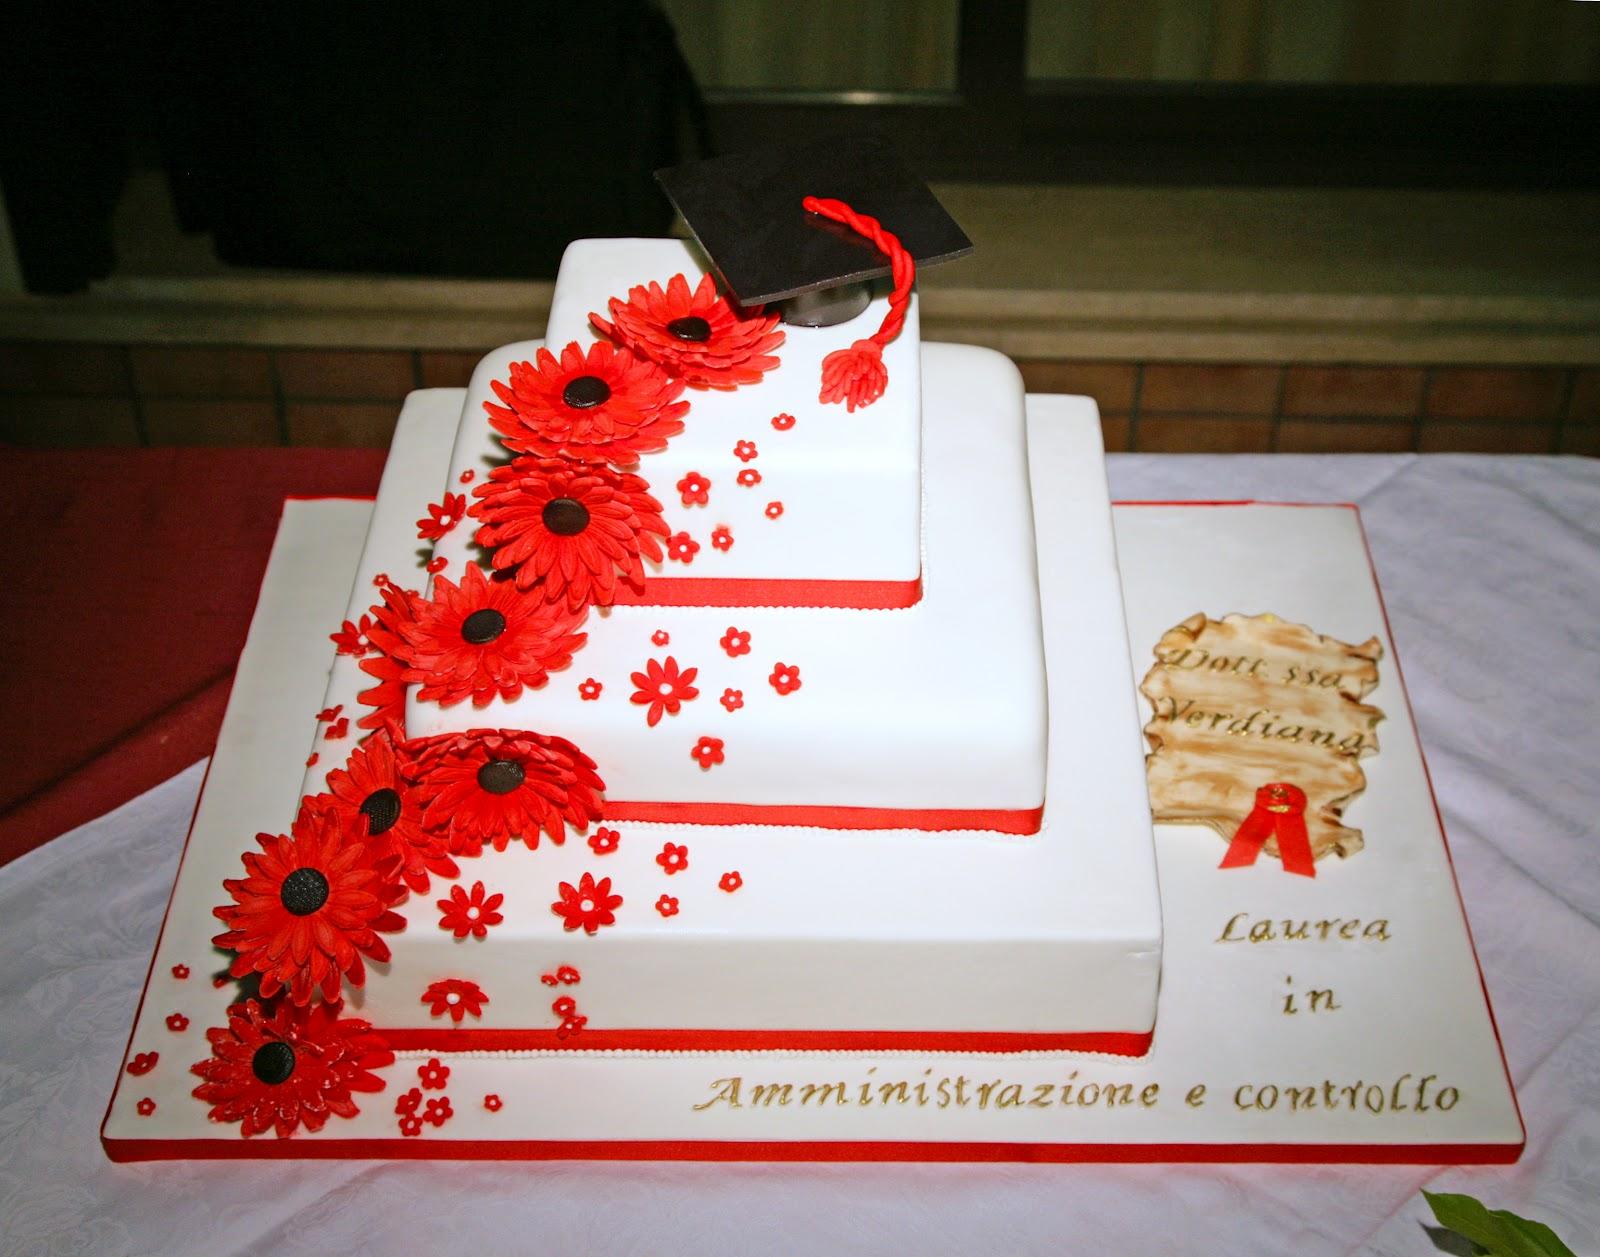 Dolce candy torta di laurea con gerbere rosse for Laurea in design